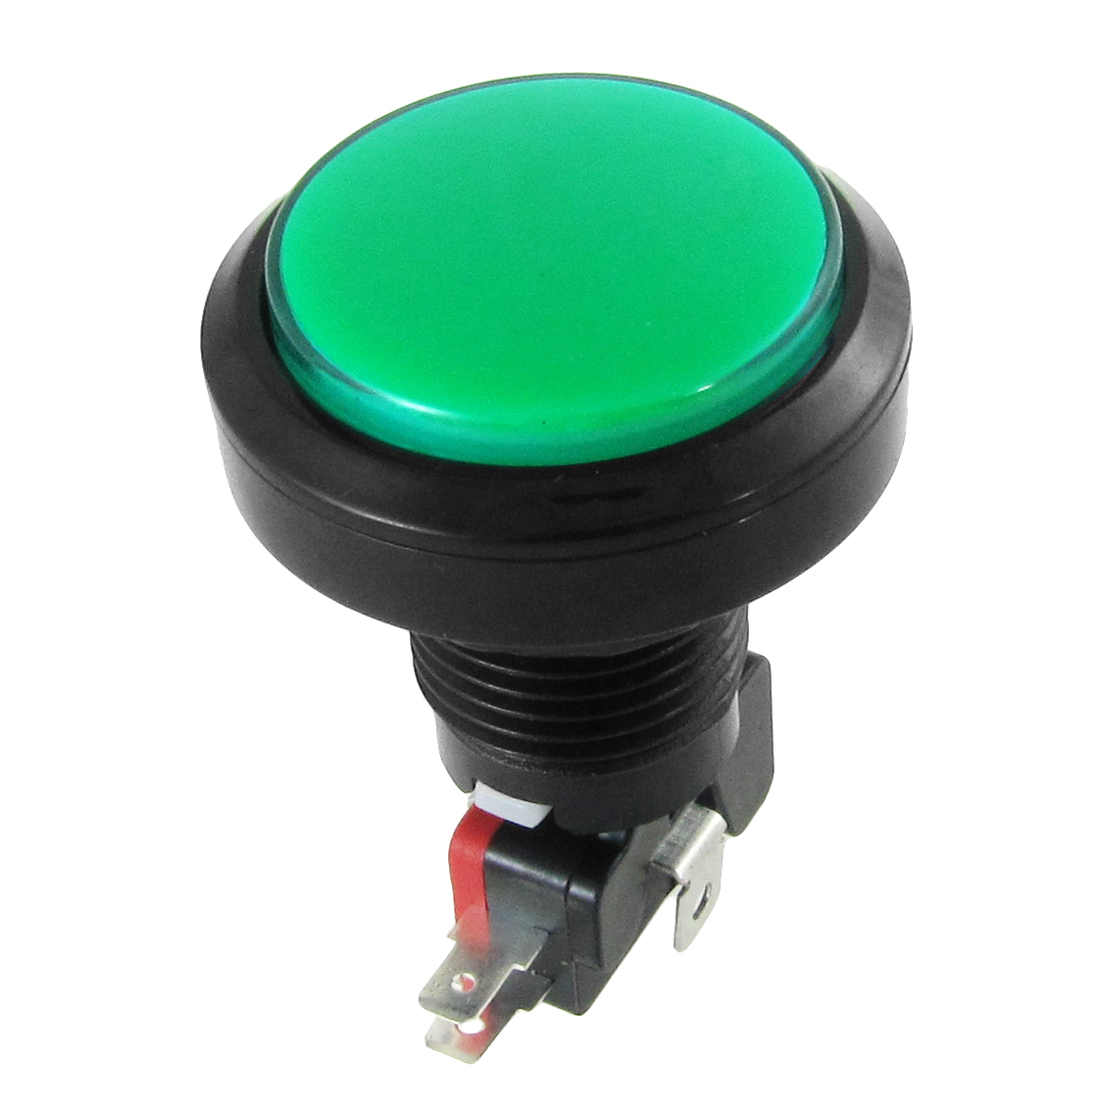 12V DC LED Light Illuminated Green Round Momentary Push Button Switch 1 NO 1 NC